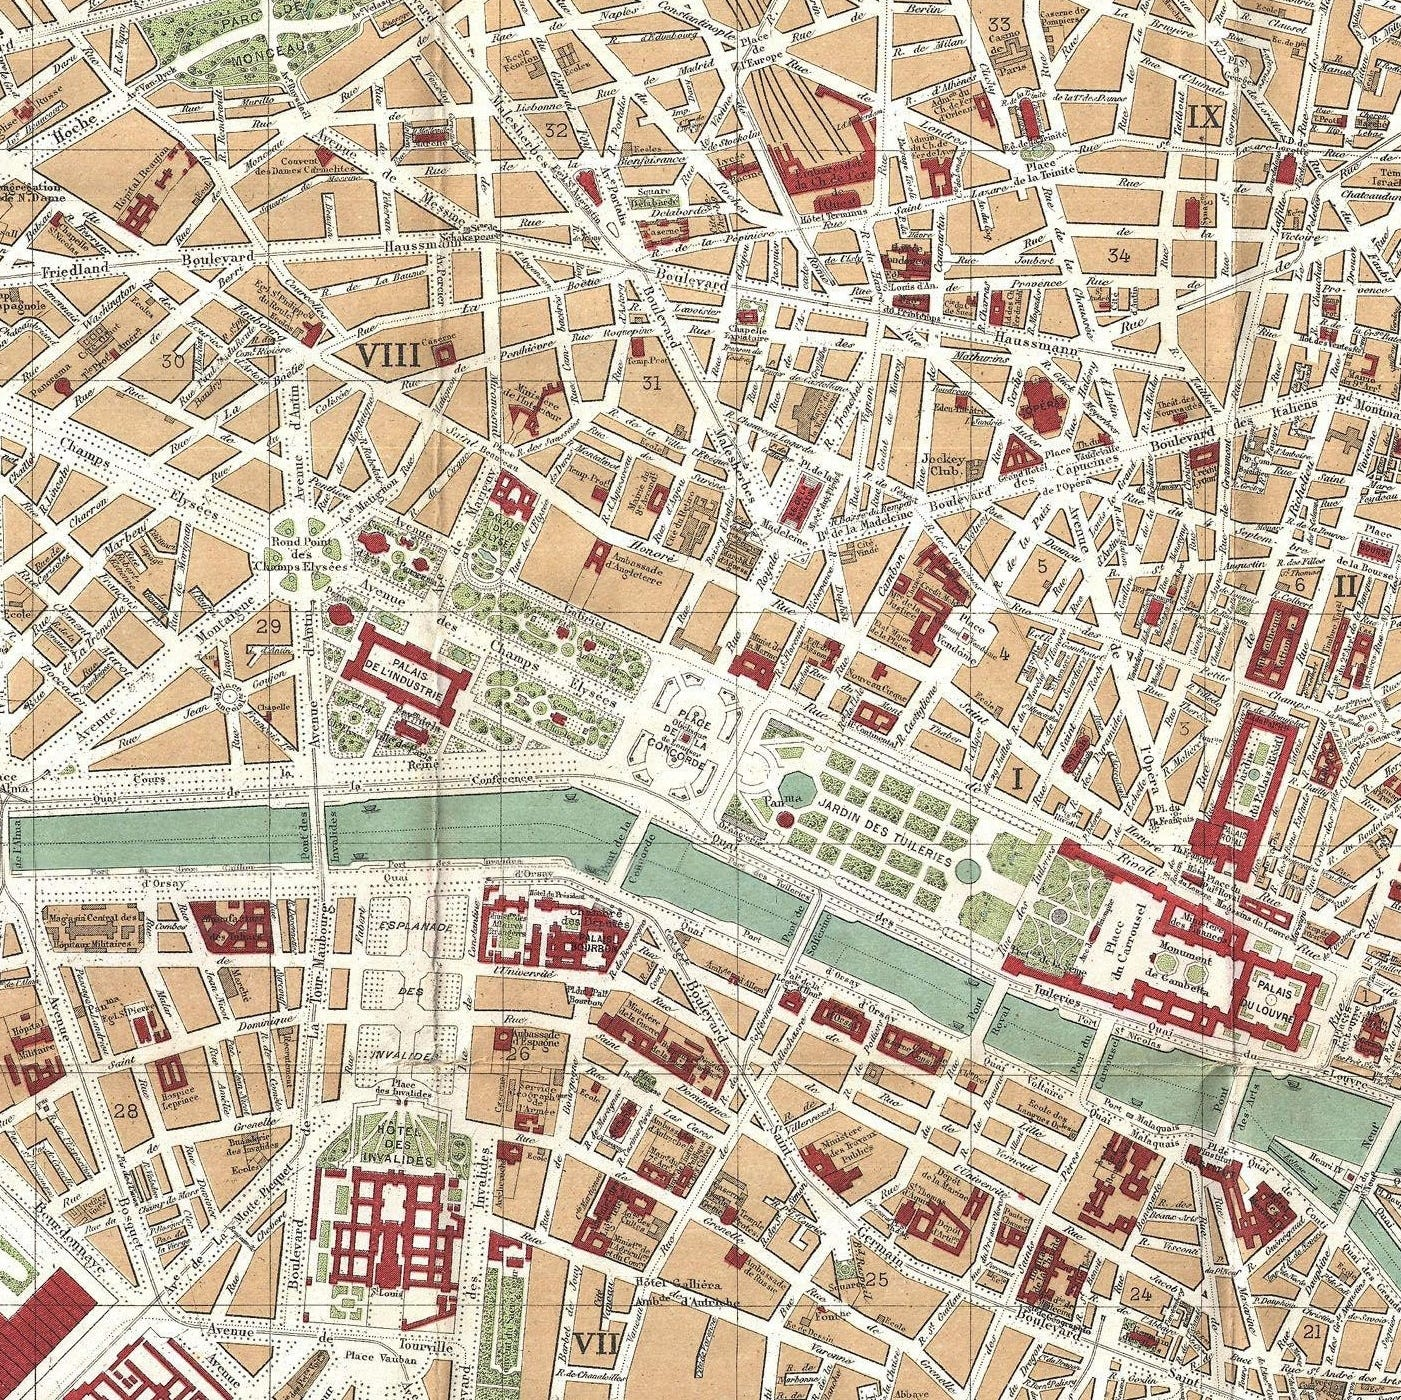 Place de la Concorde | Historic Geoscapes